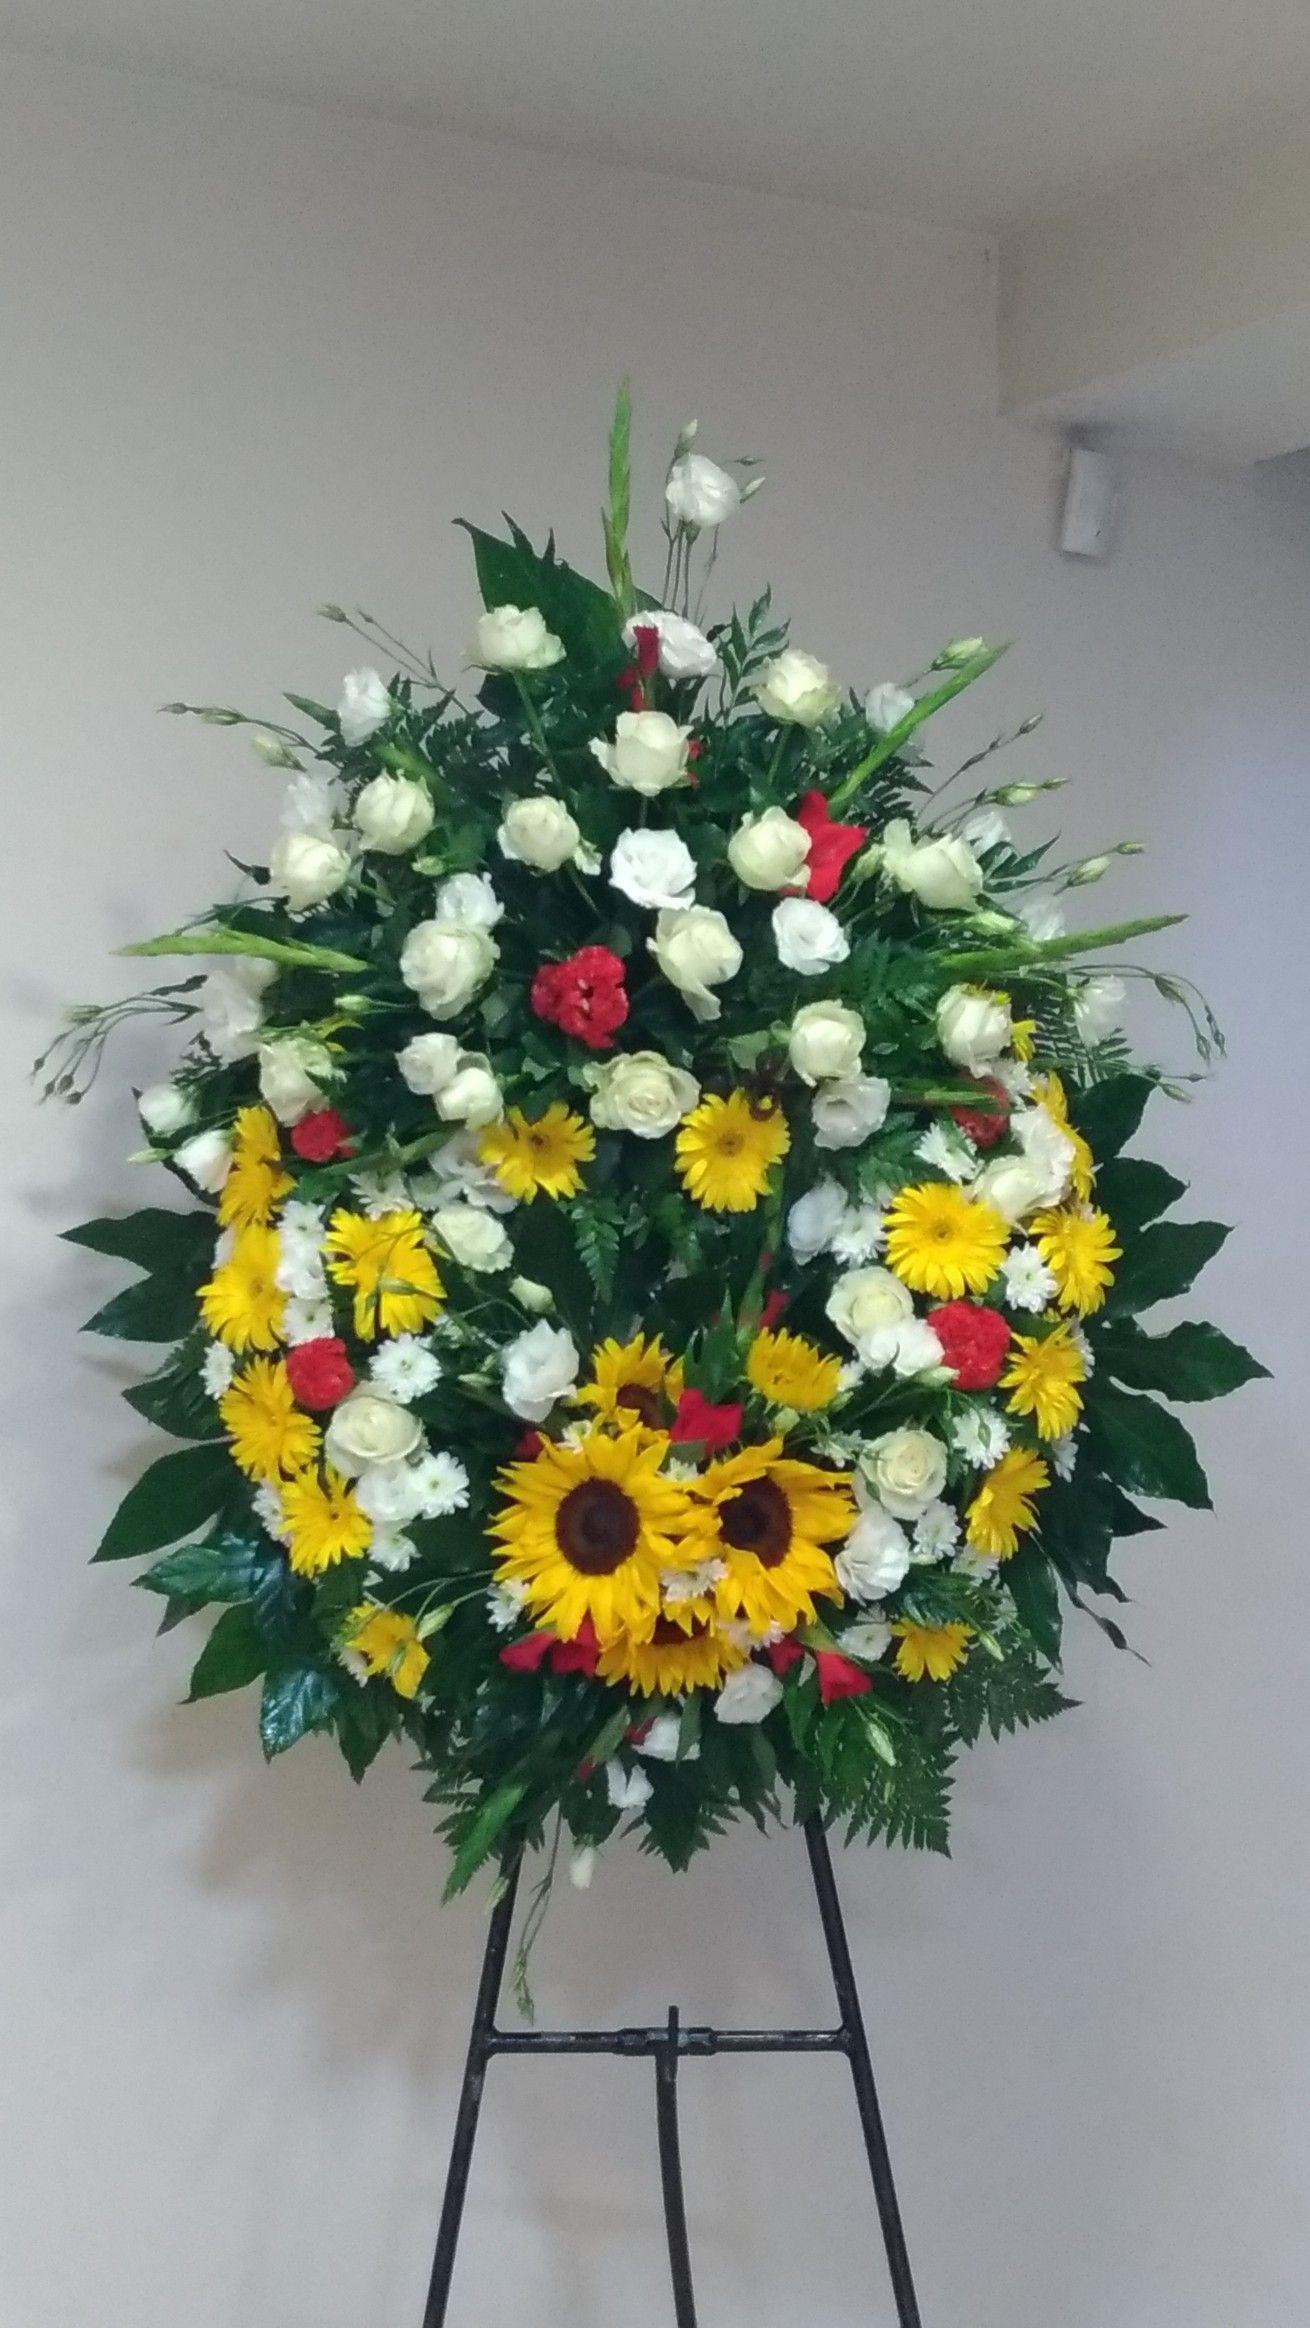 Pin by marialena nichols on hand creations pinterest flowers flower spray sympathy flowers flower designs flower arrangements funeral pots izmirmasajfo